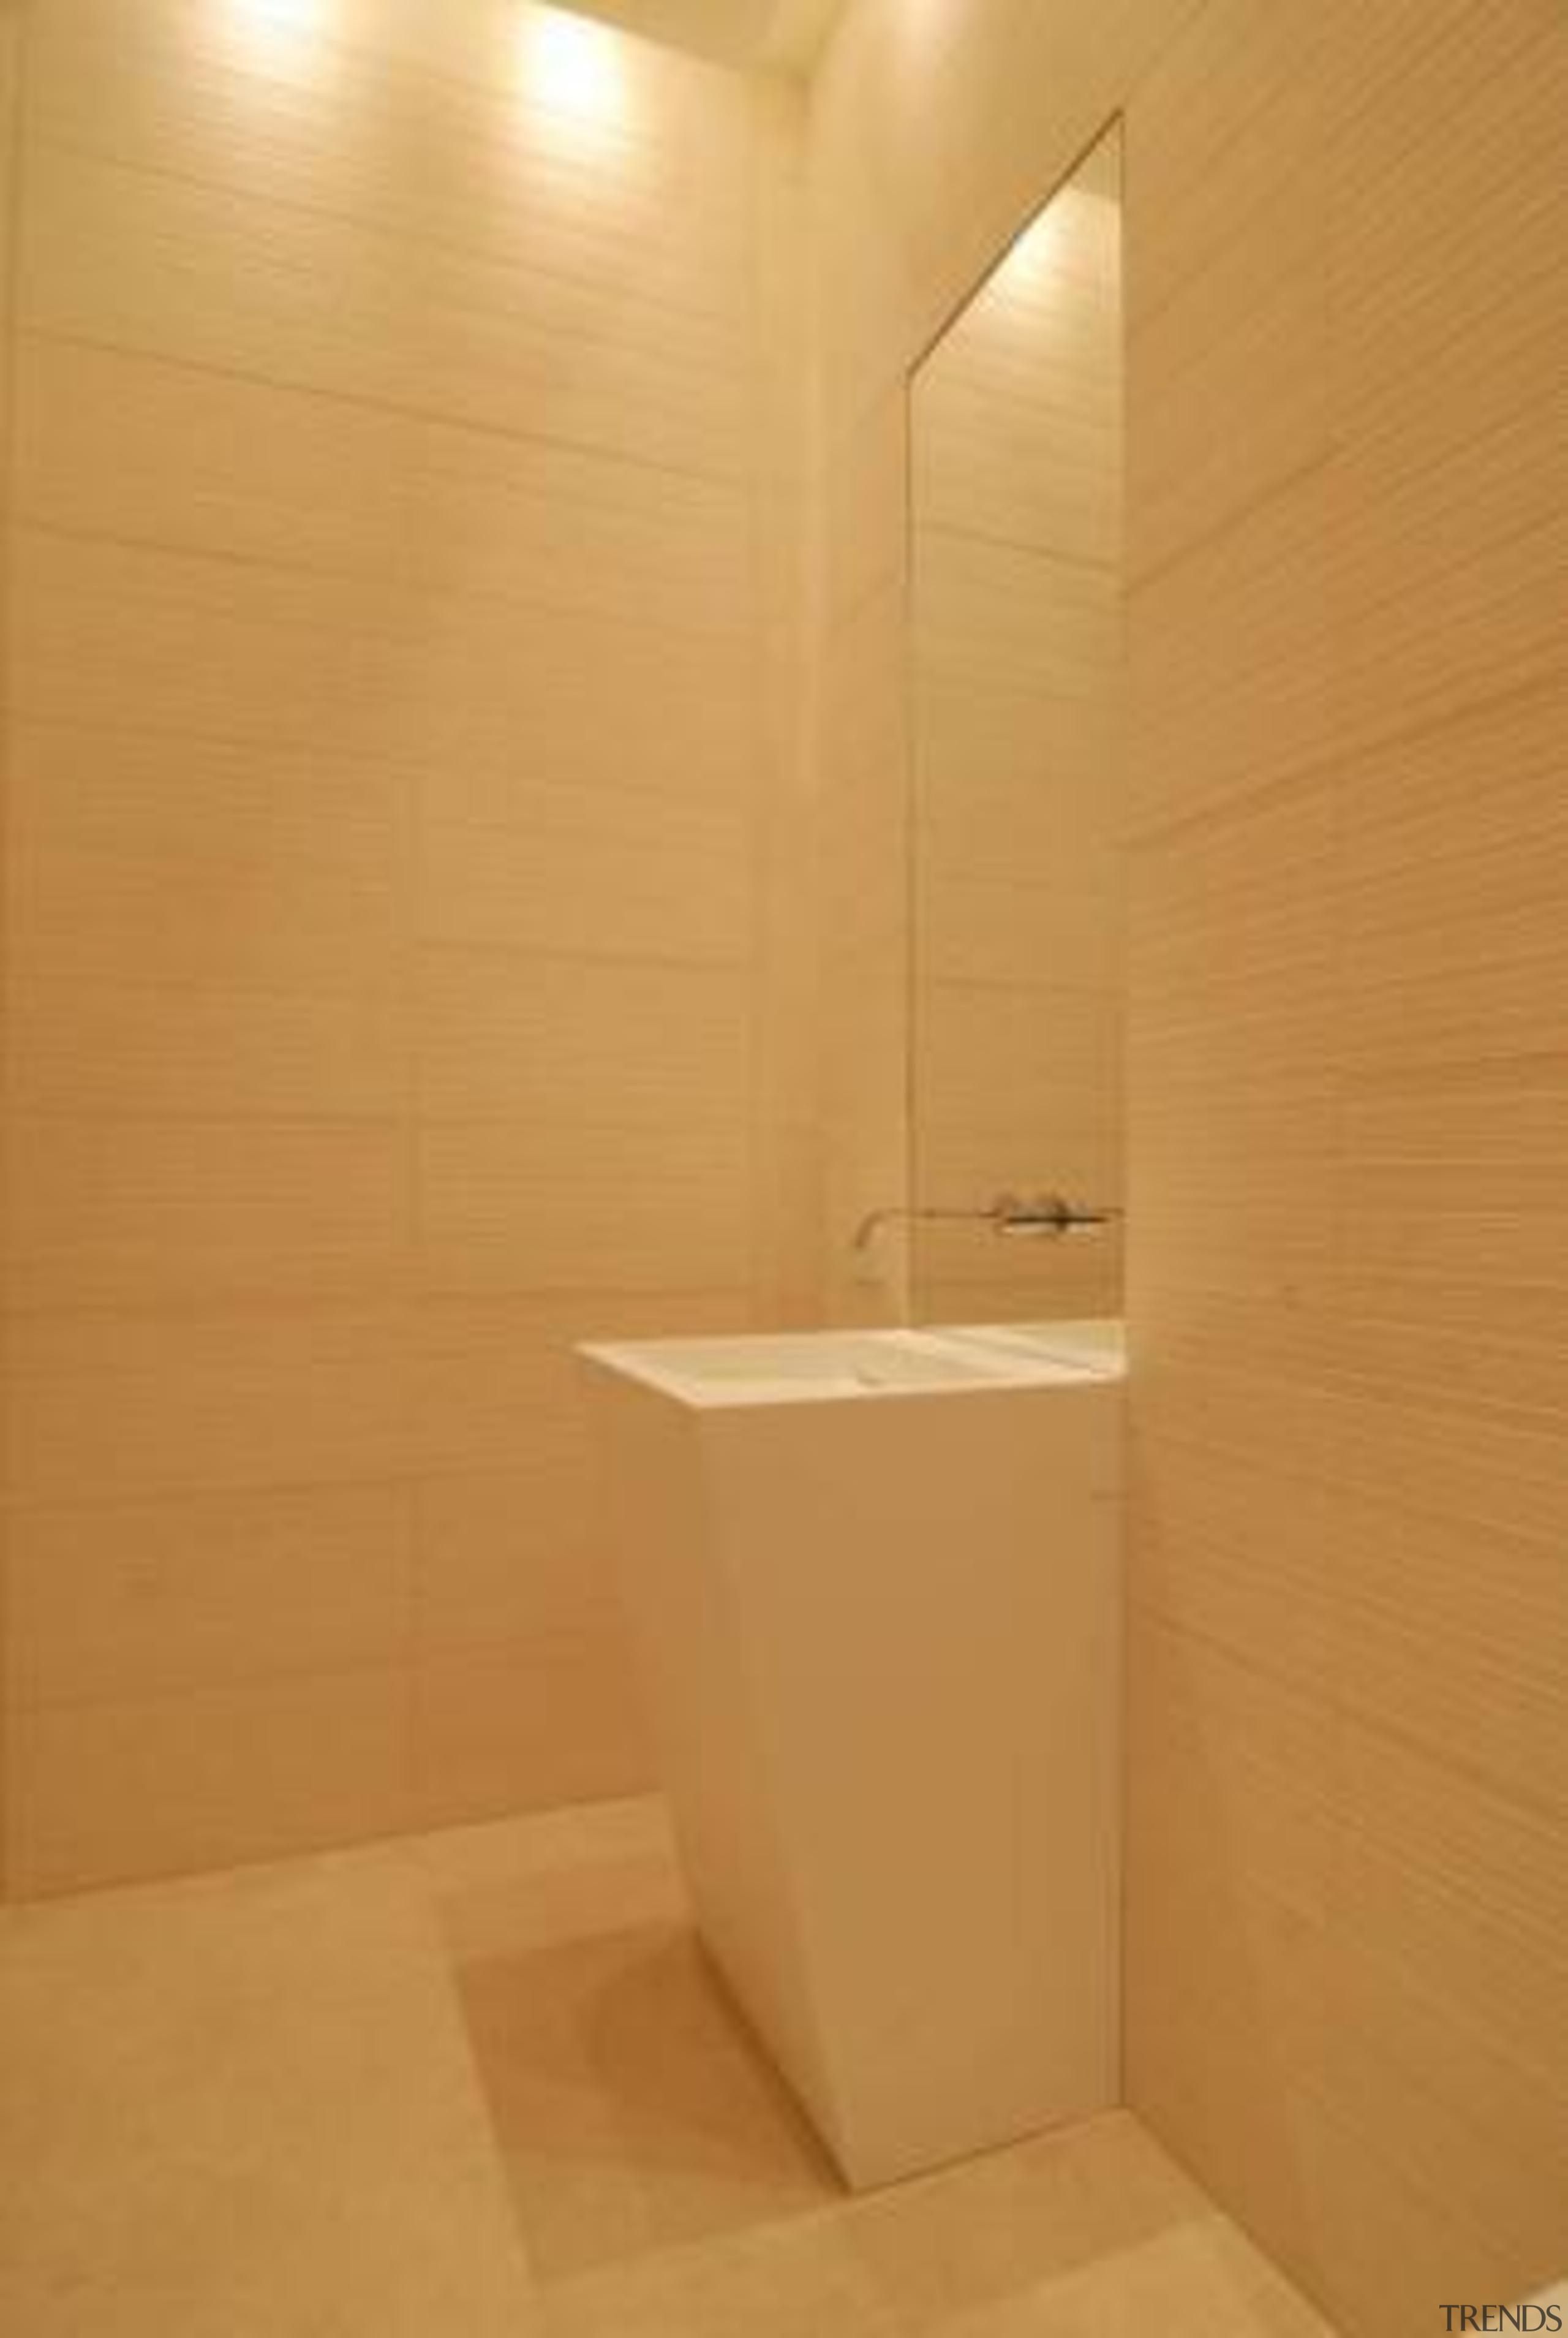 Source: Trulia bathroom, ceiling, floor, interior design, plumbing fixture, product design, property, room, tile, toilet, toilet seat, wall, wood, orange